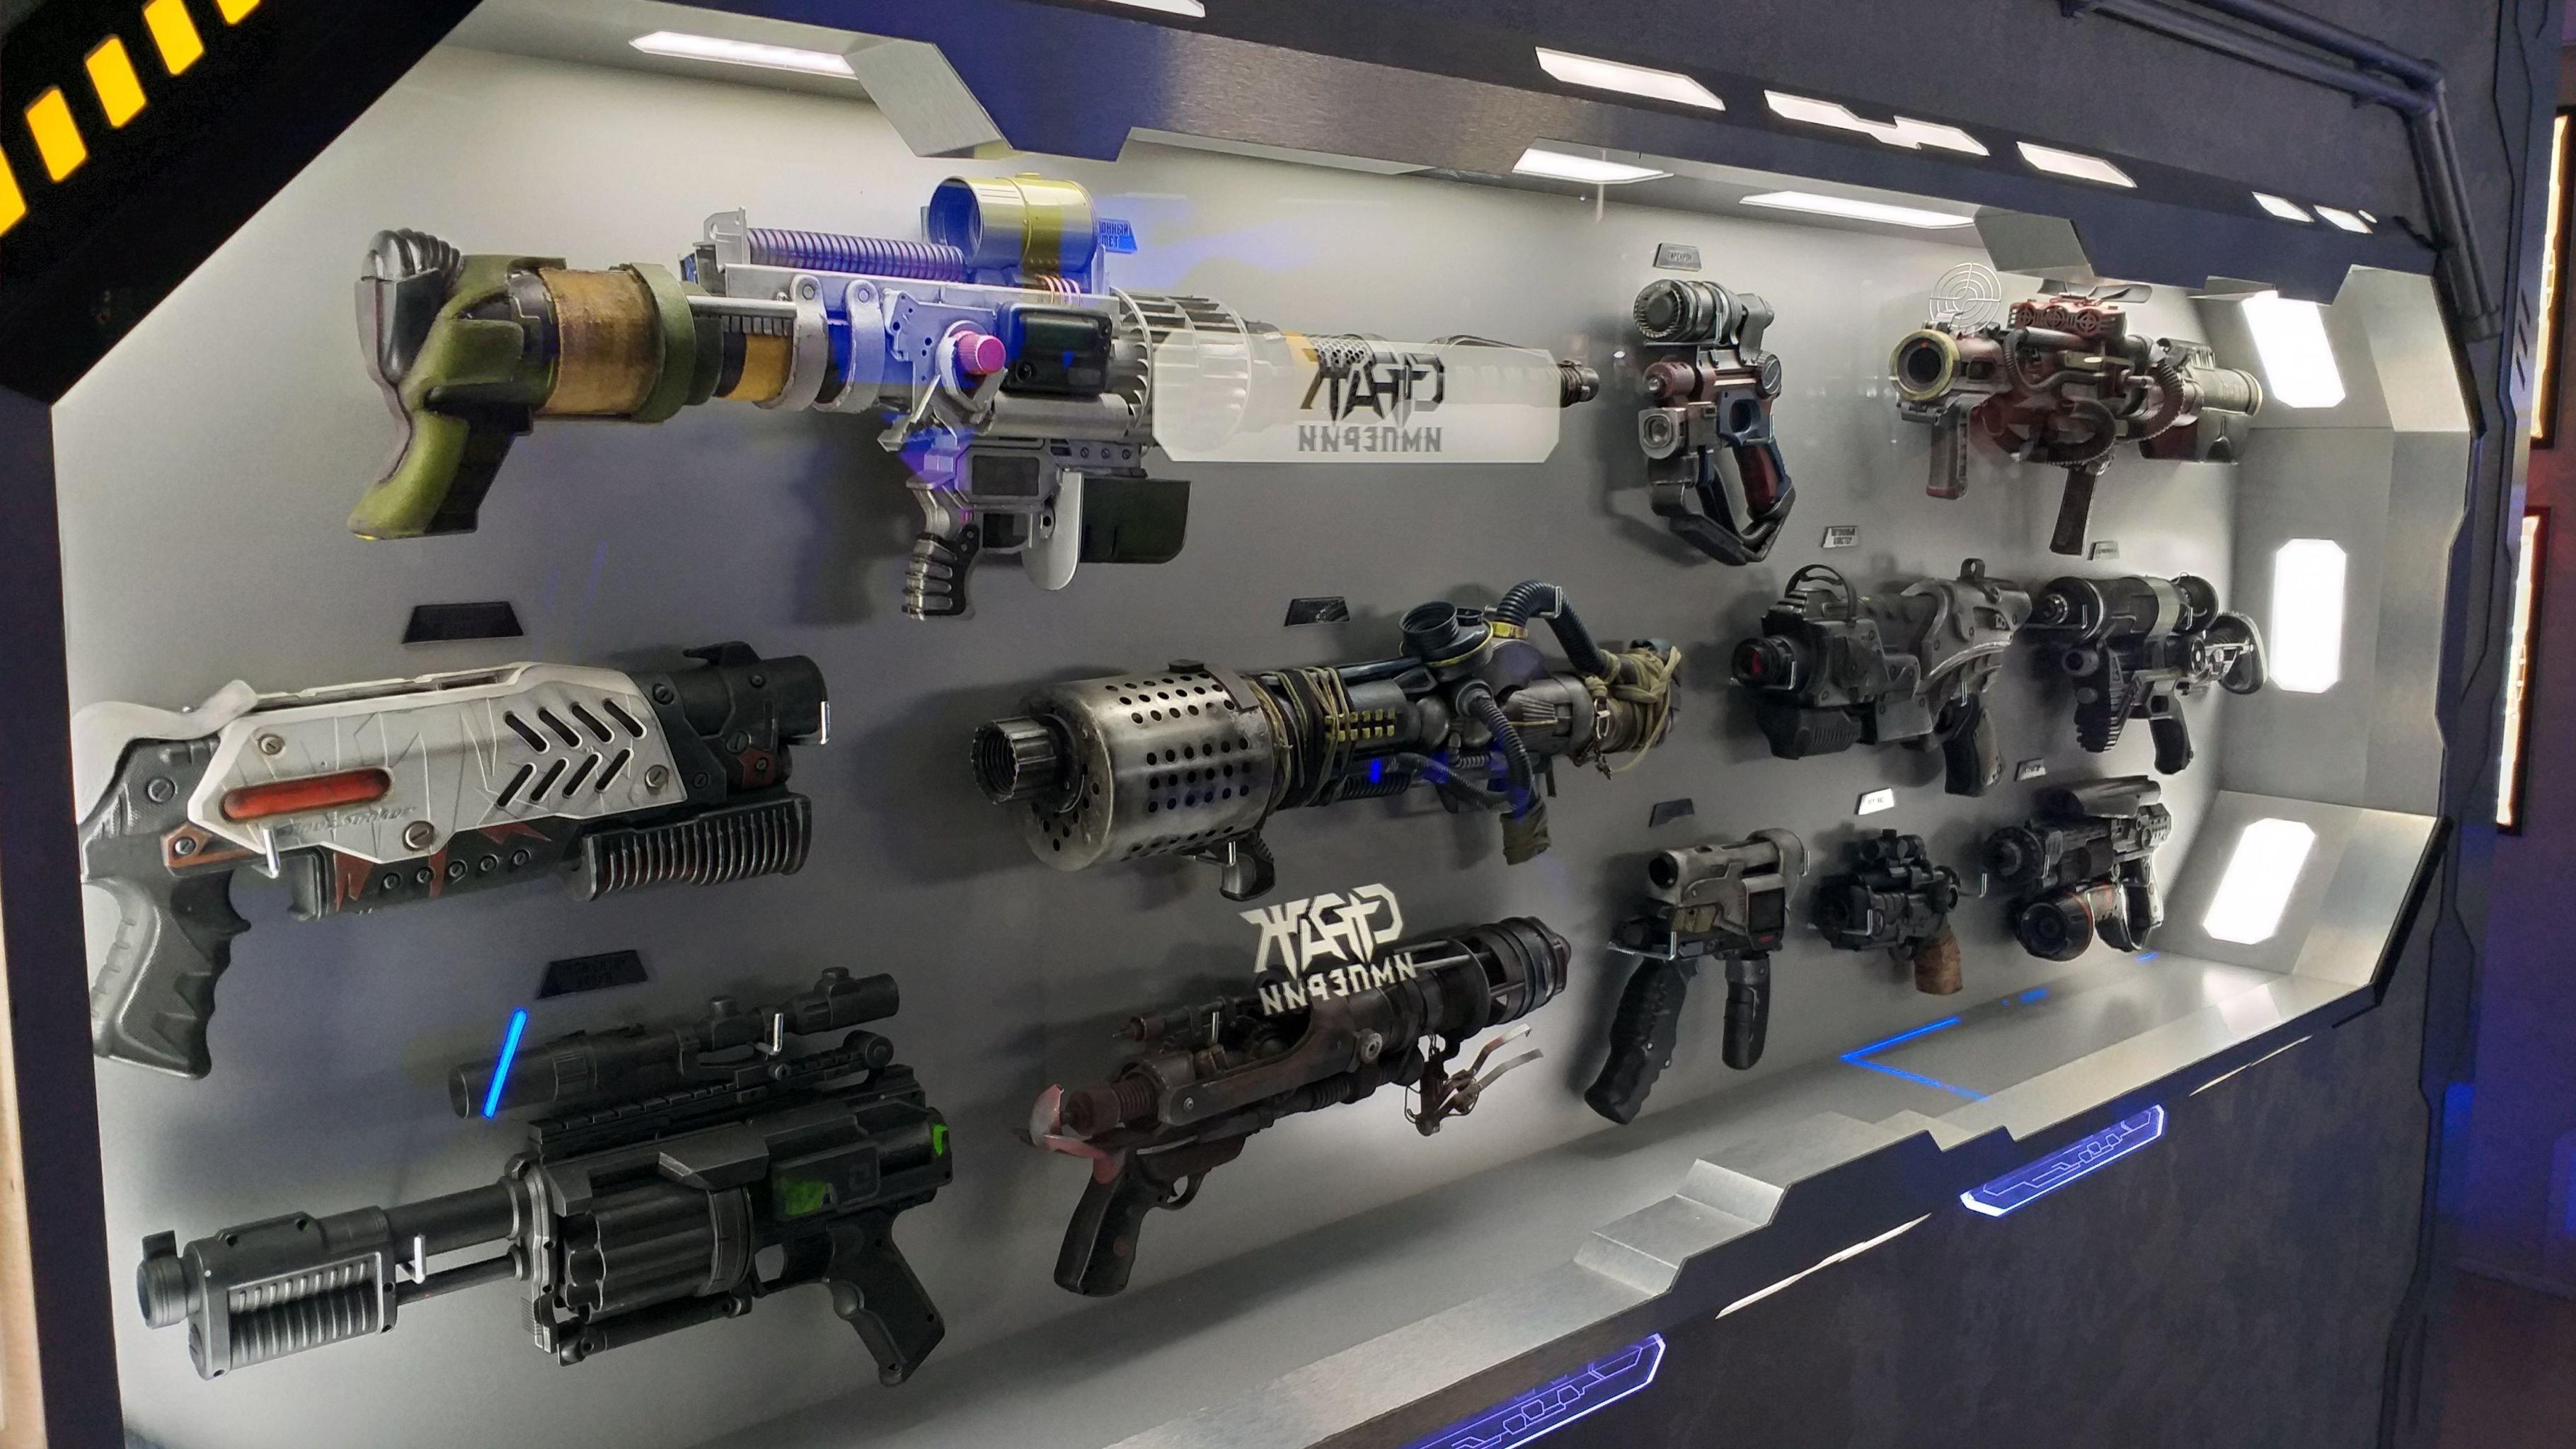 Las armas extraterrestres que los huéspedes podrán apreciar en el hotel en Alushta (Crimea).